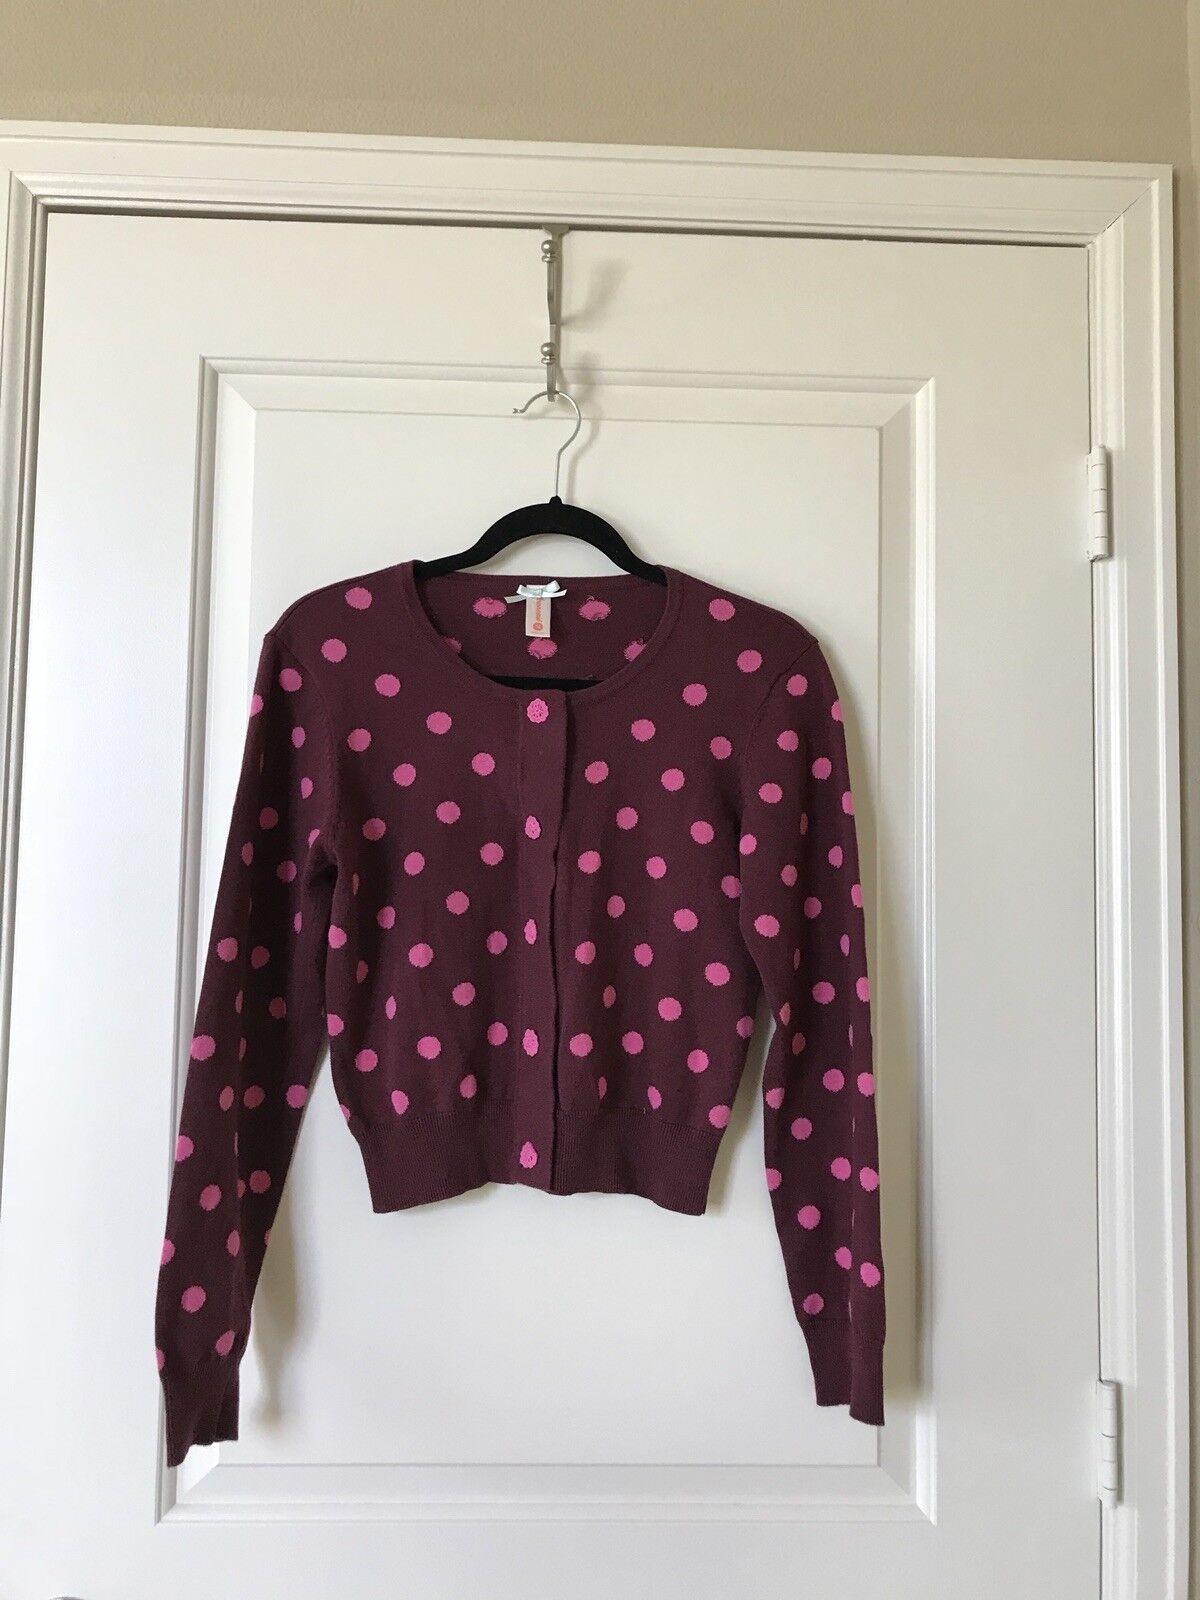 Modcloth Maroon Pink Polka Dot Crop Cardigan, Size M